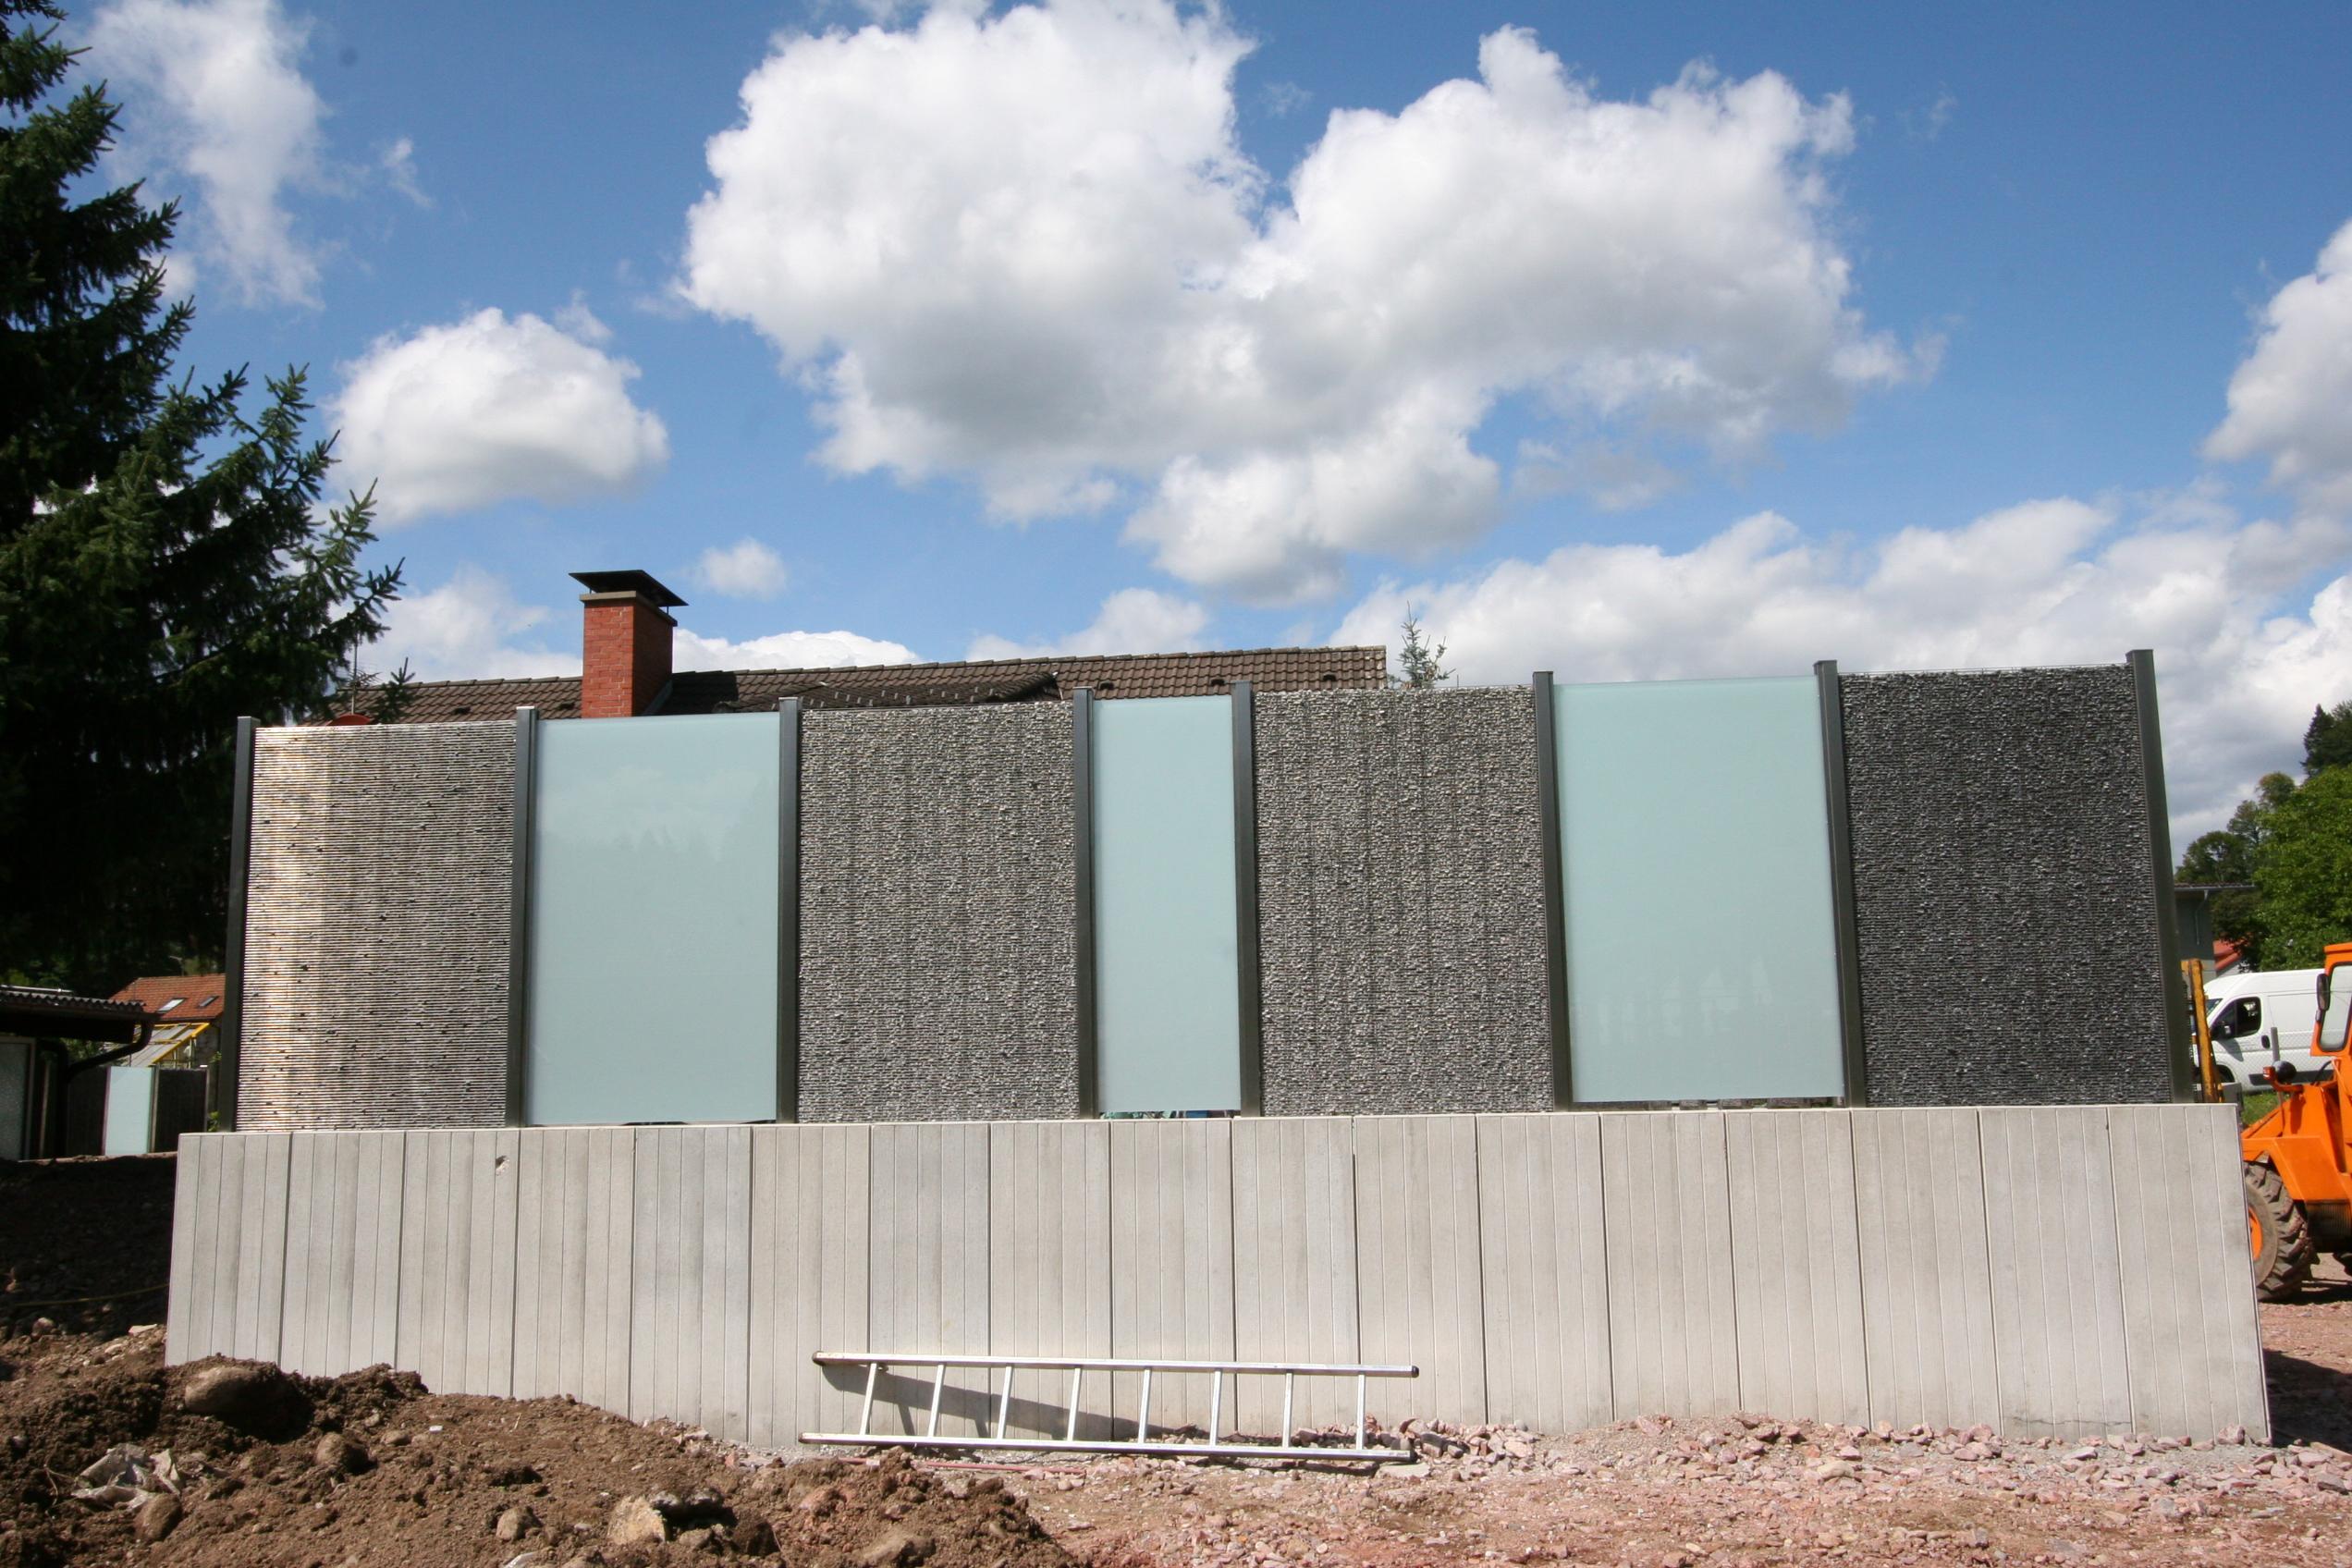 Recinzioni residenziali industriali for Case moderne industriali in vendita